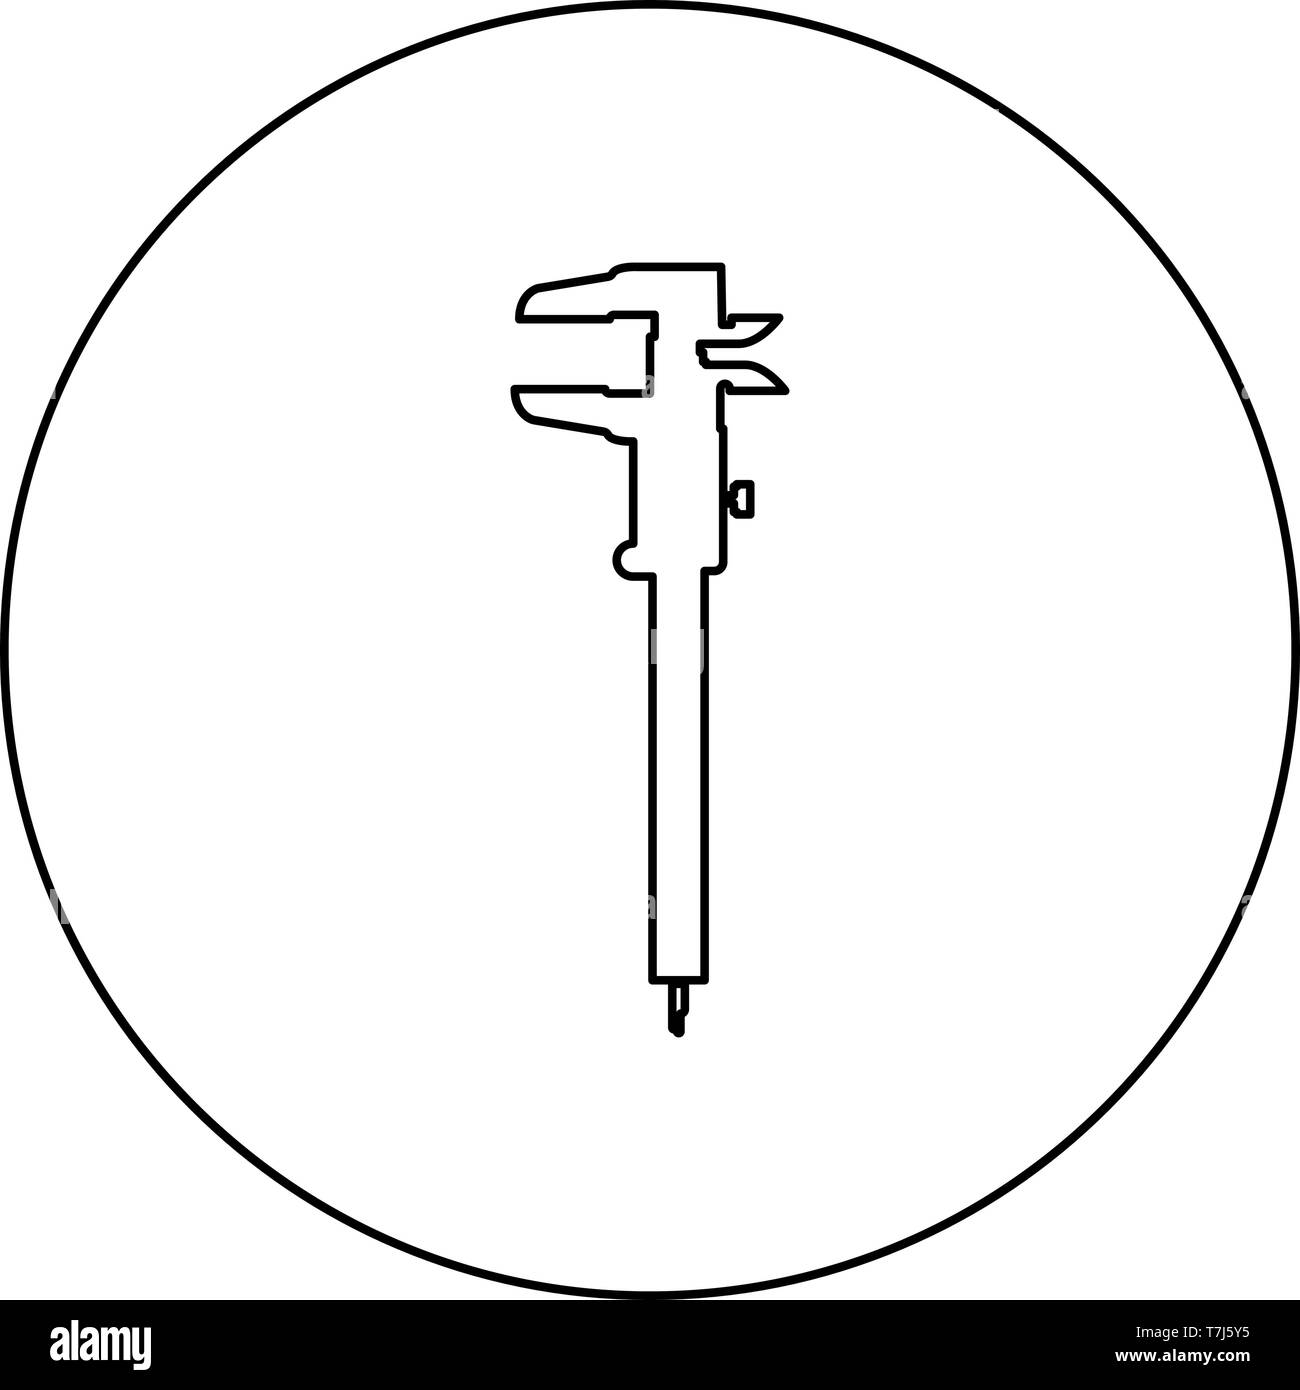 hight resolution of caliper hand caliper sliding caliper vernier caliper caliper gage slide gage trammel icon in circle round